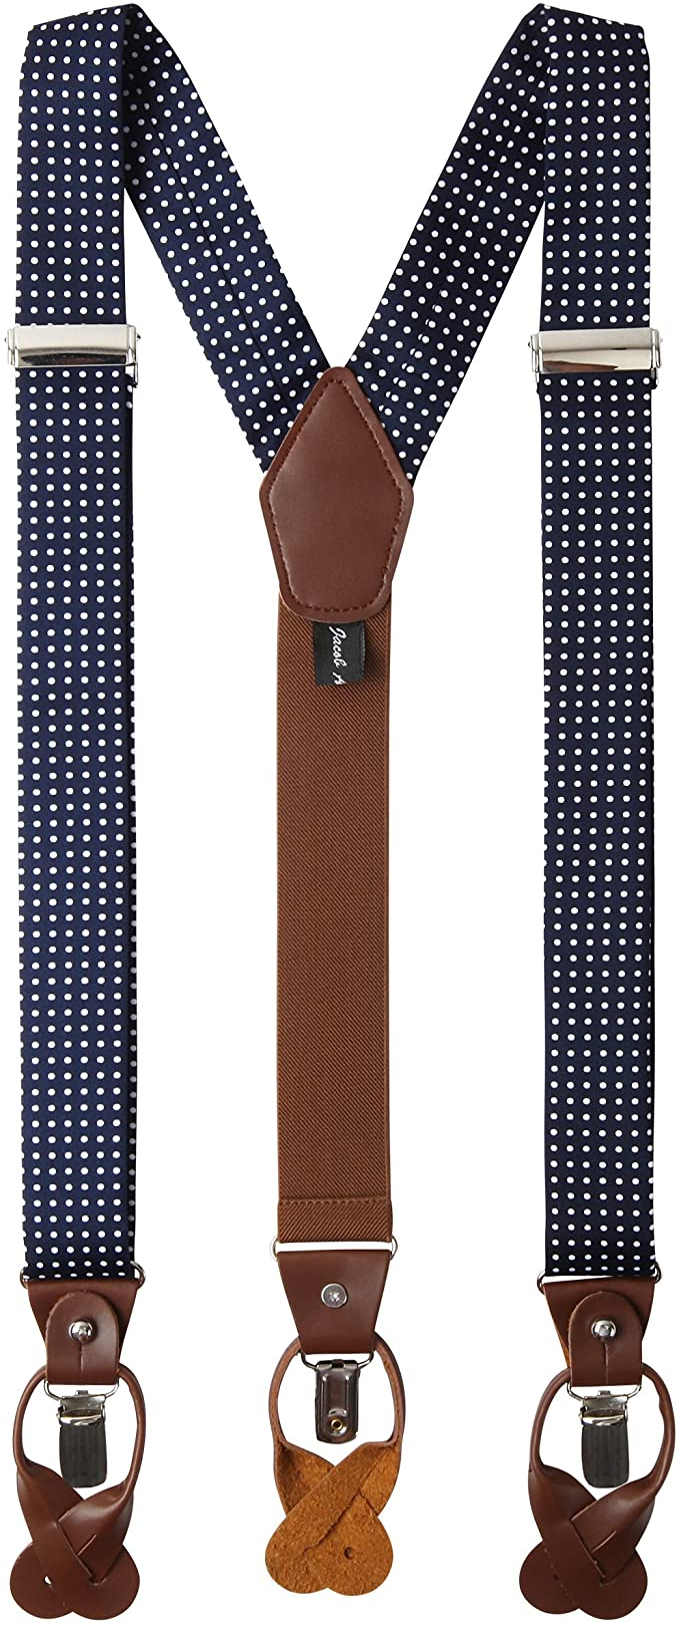 Men's Vintage Style Suspenders Braces Jacob Alexander Mens Polka Dot Y-Back Suspenders Braces Convertible Leather Ends and Clips  AT vintagedancer.com